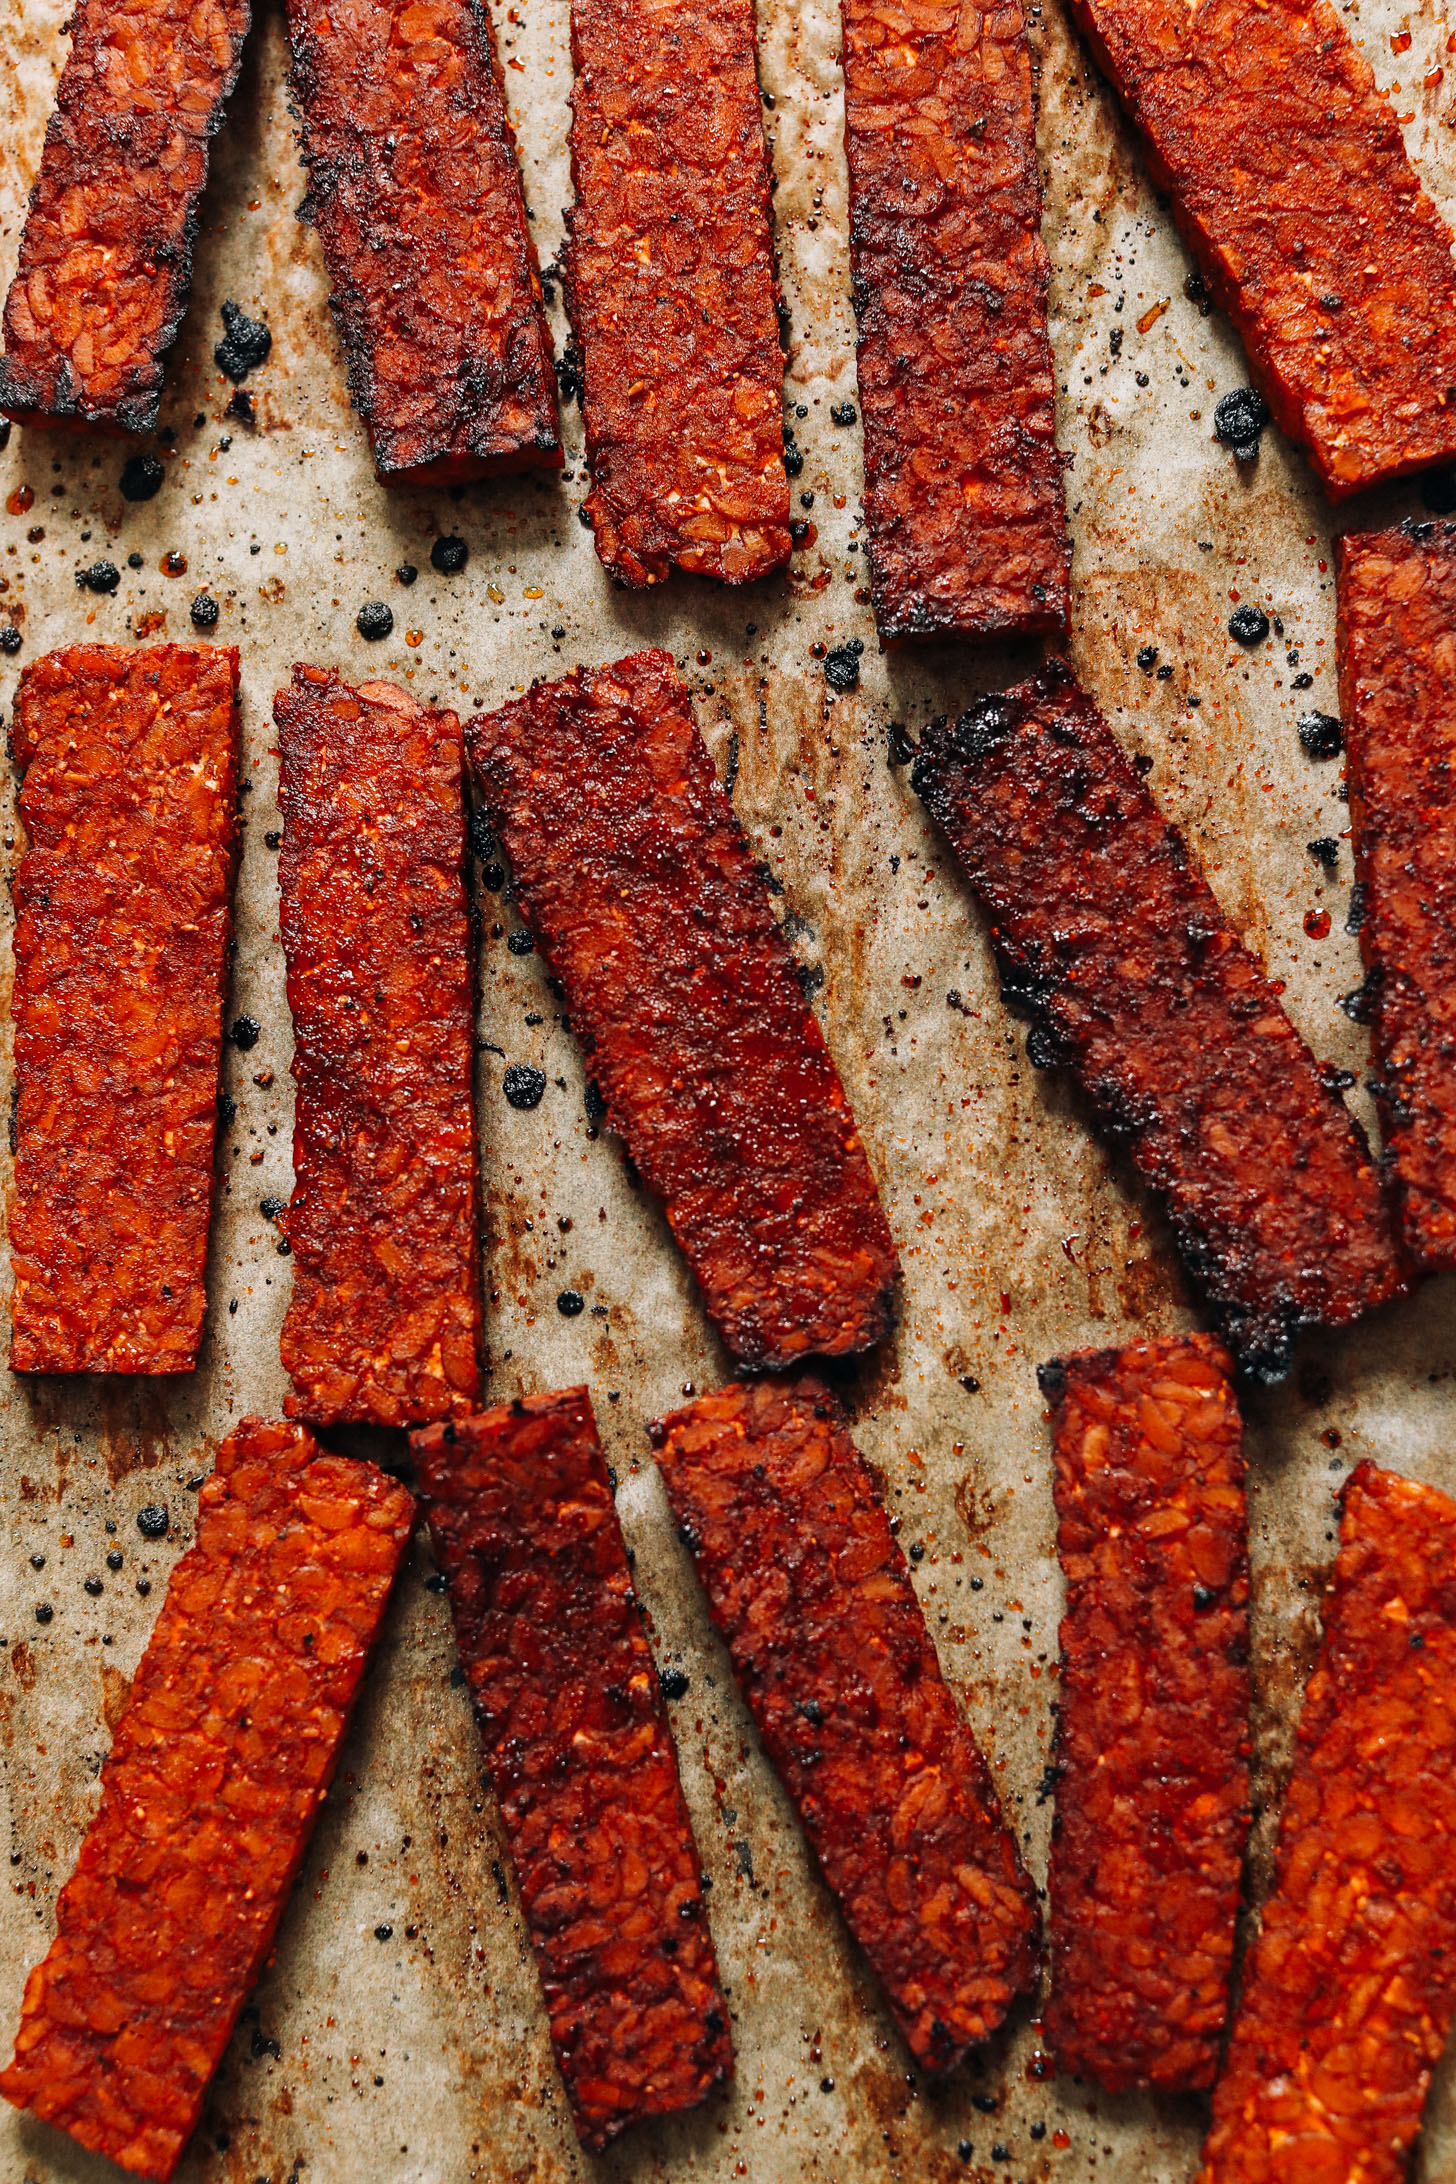 Baked tempeh bacon strips on a baking sheet